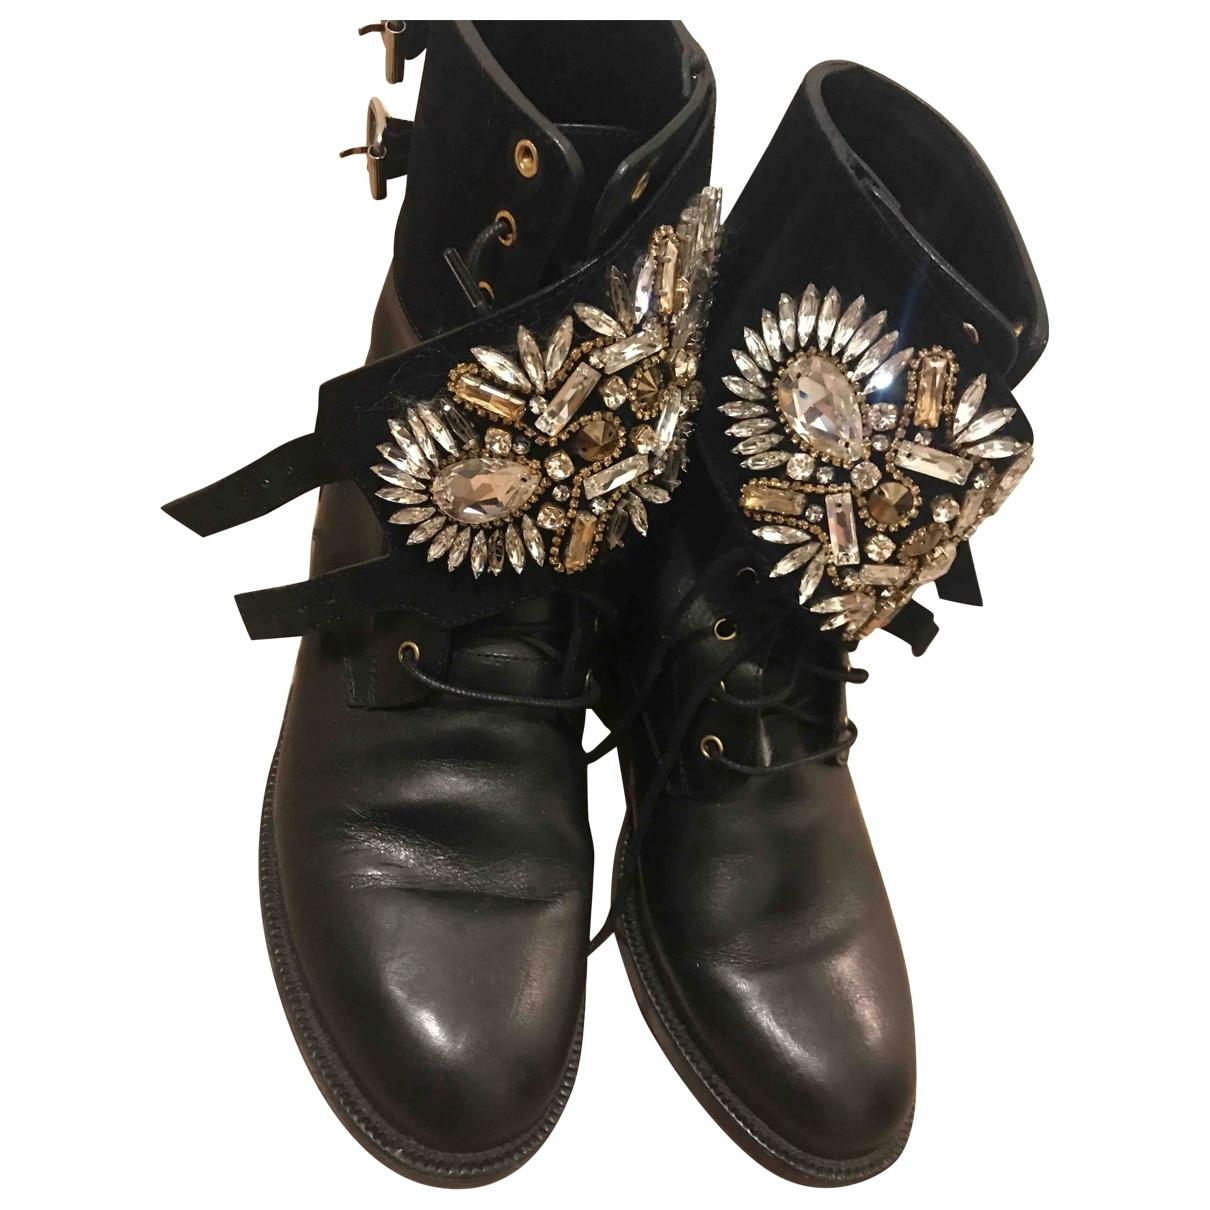 Rene Caovilla \N Black Leather Boots for Women 39 EU